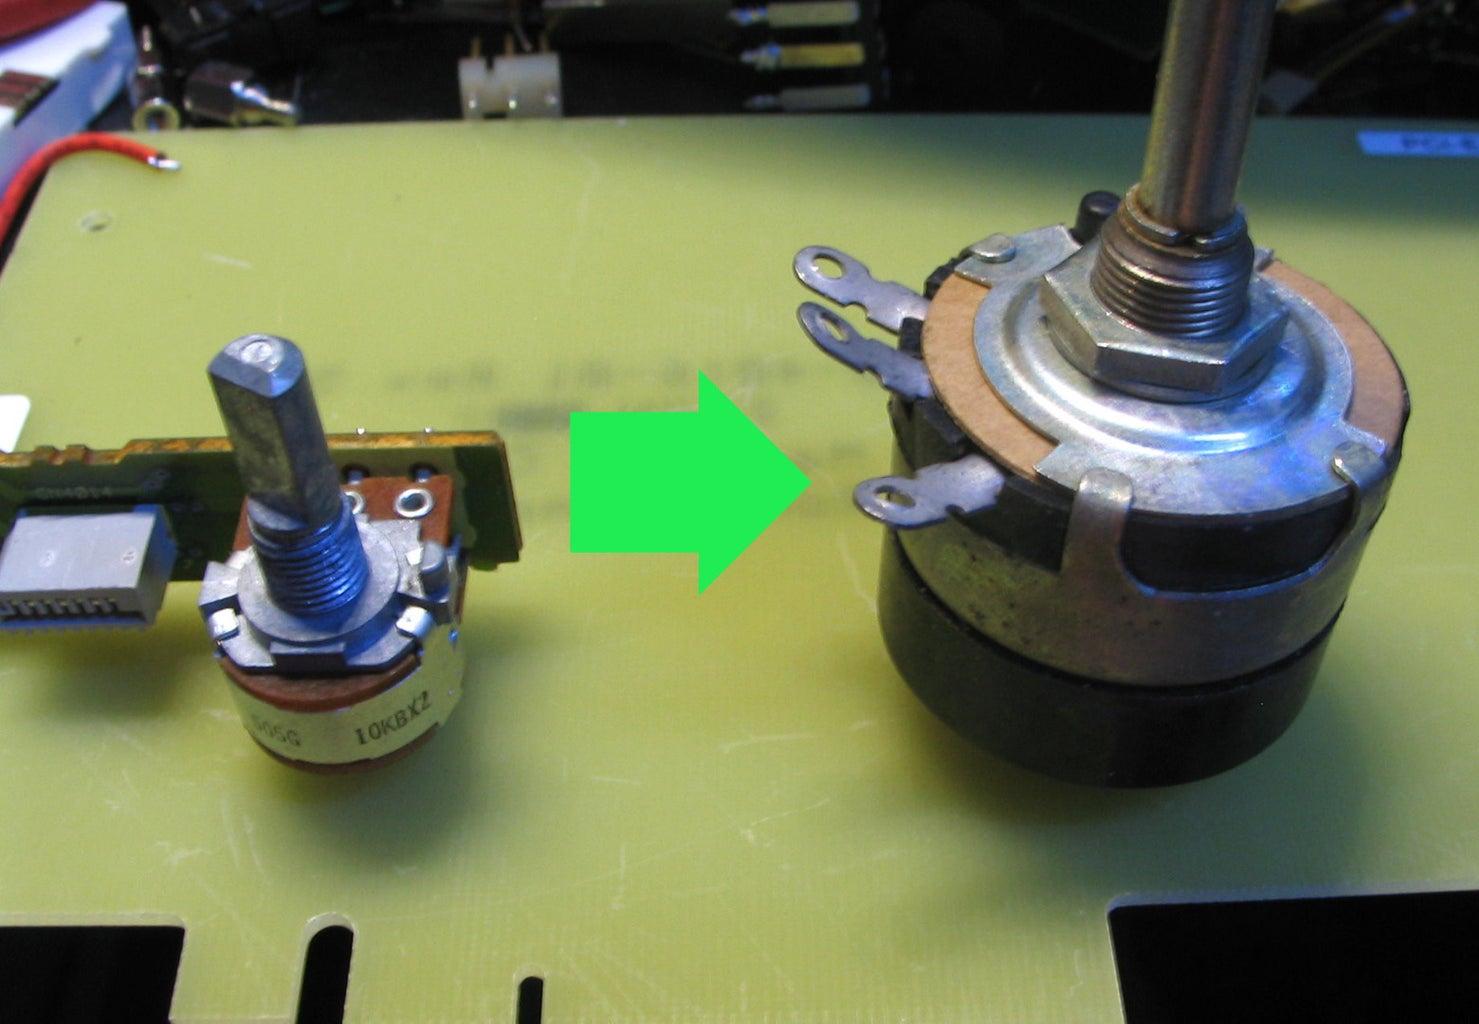 Super Simple Potentiometer Switch Hack